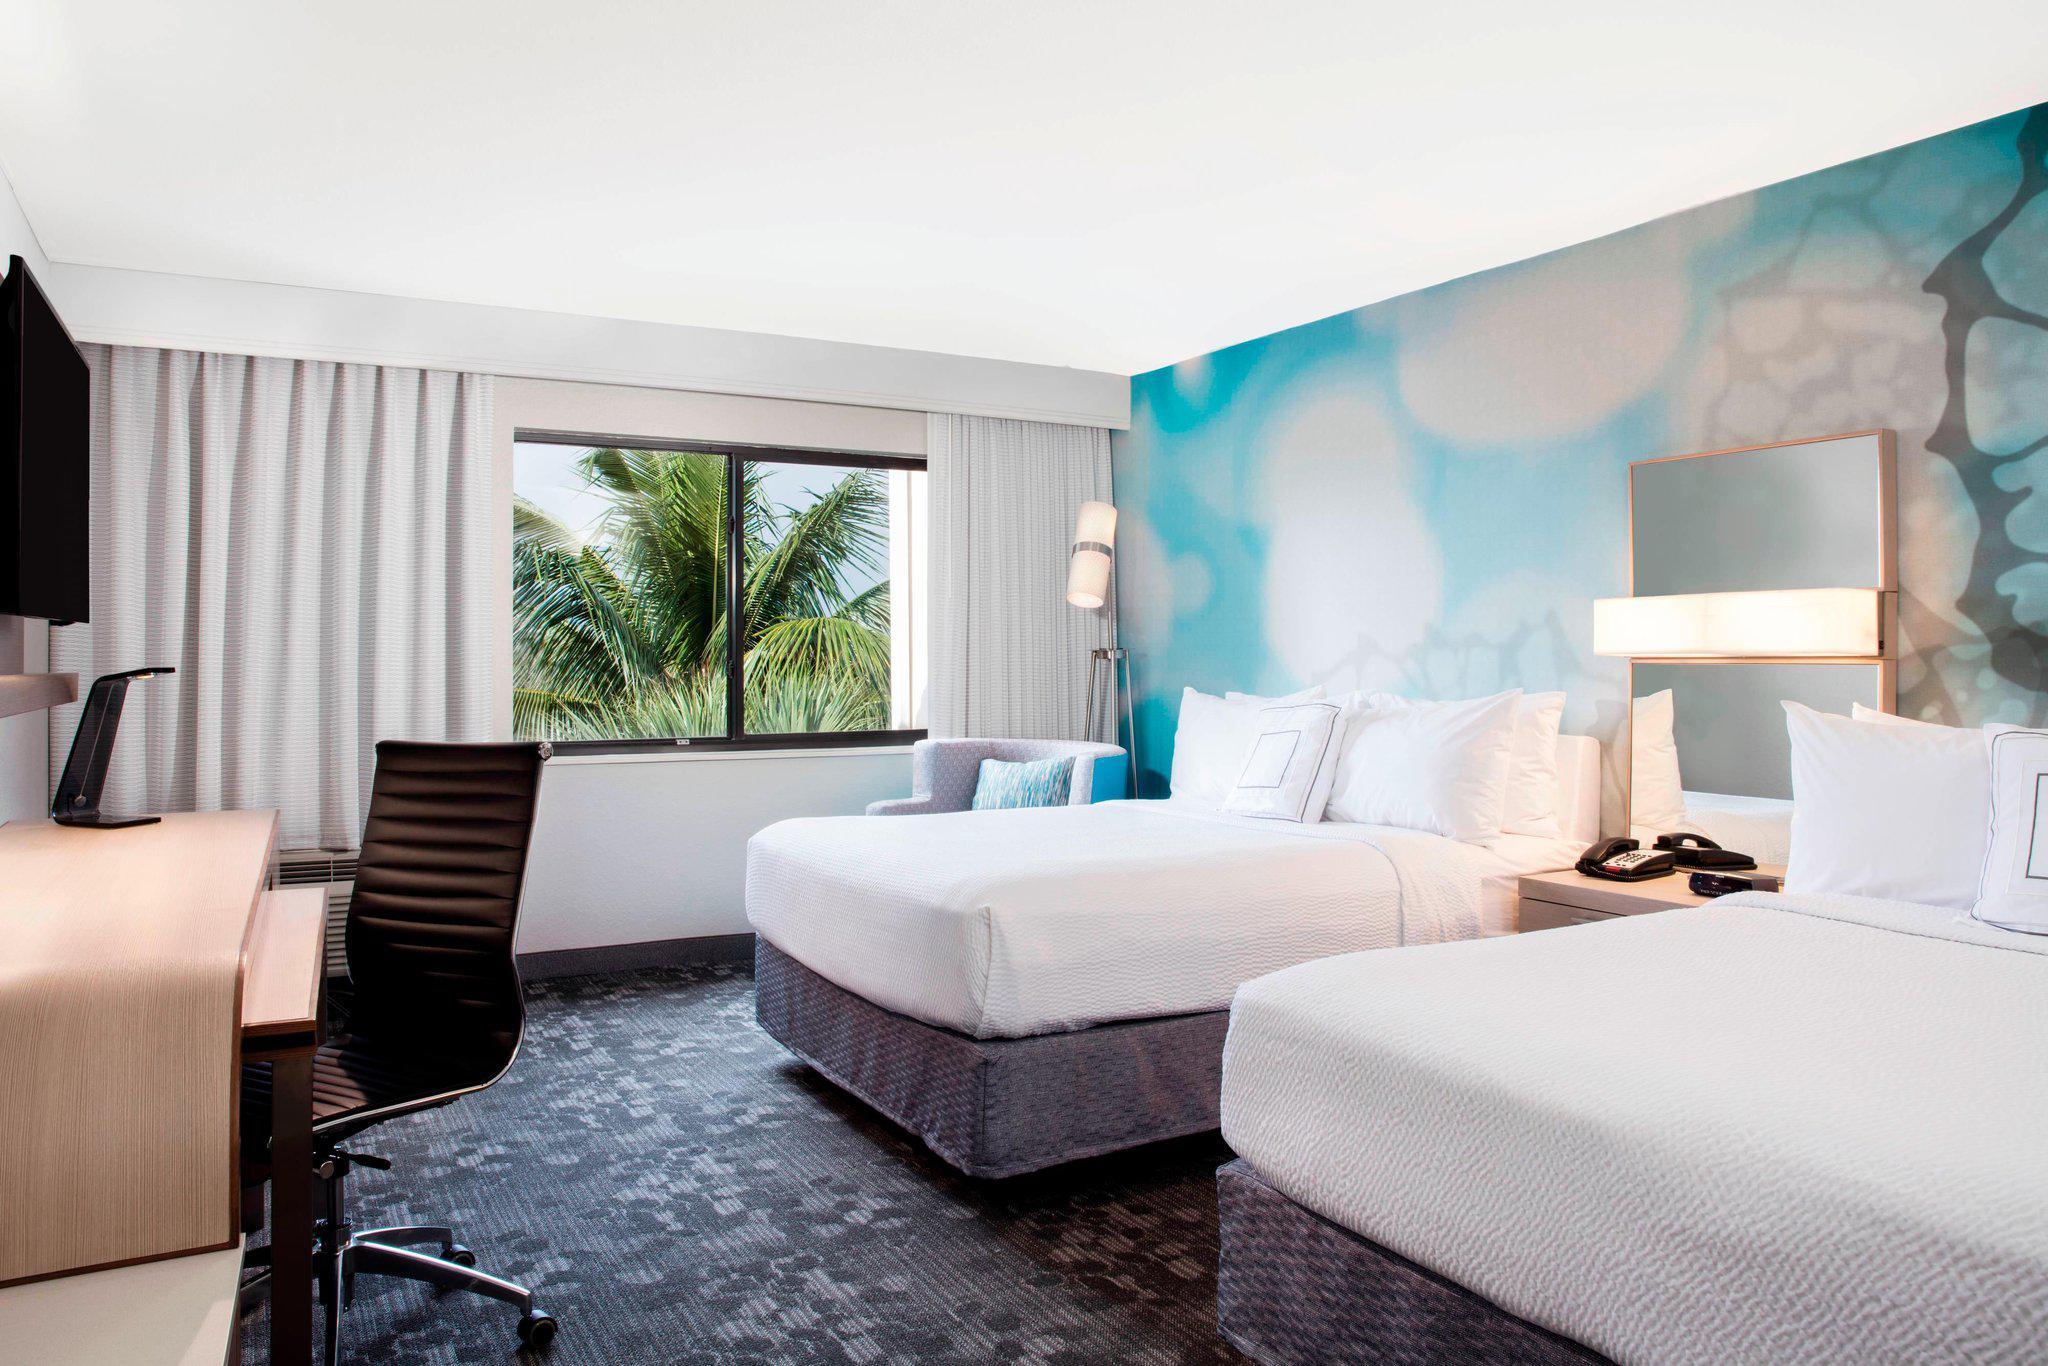 Courtyard by Marriott Fort Lauderdale Coral Springs